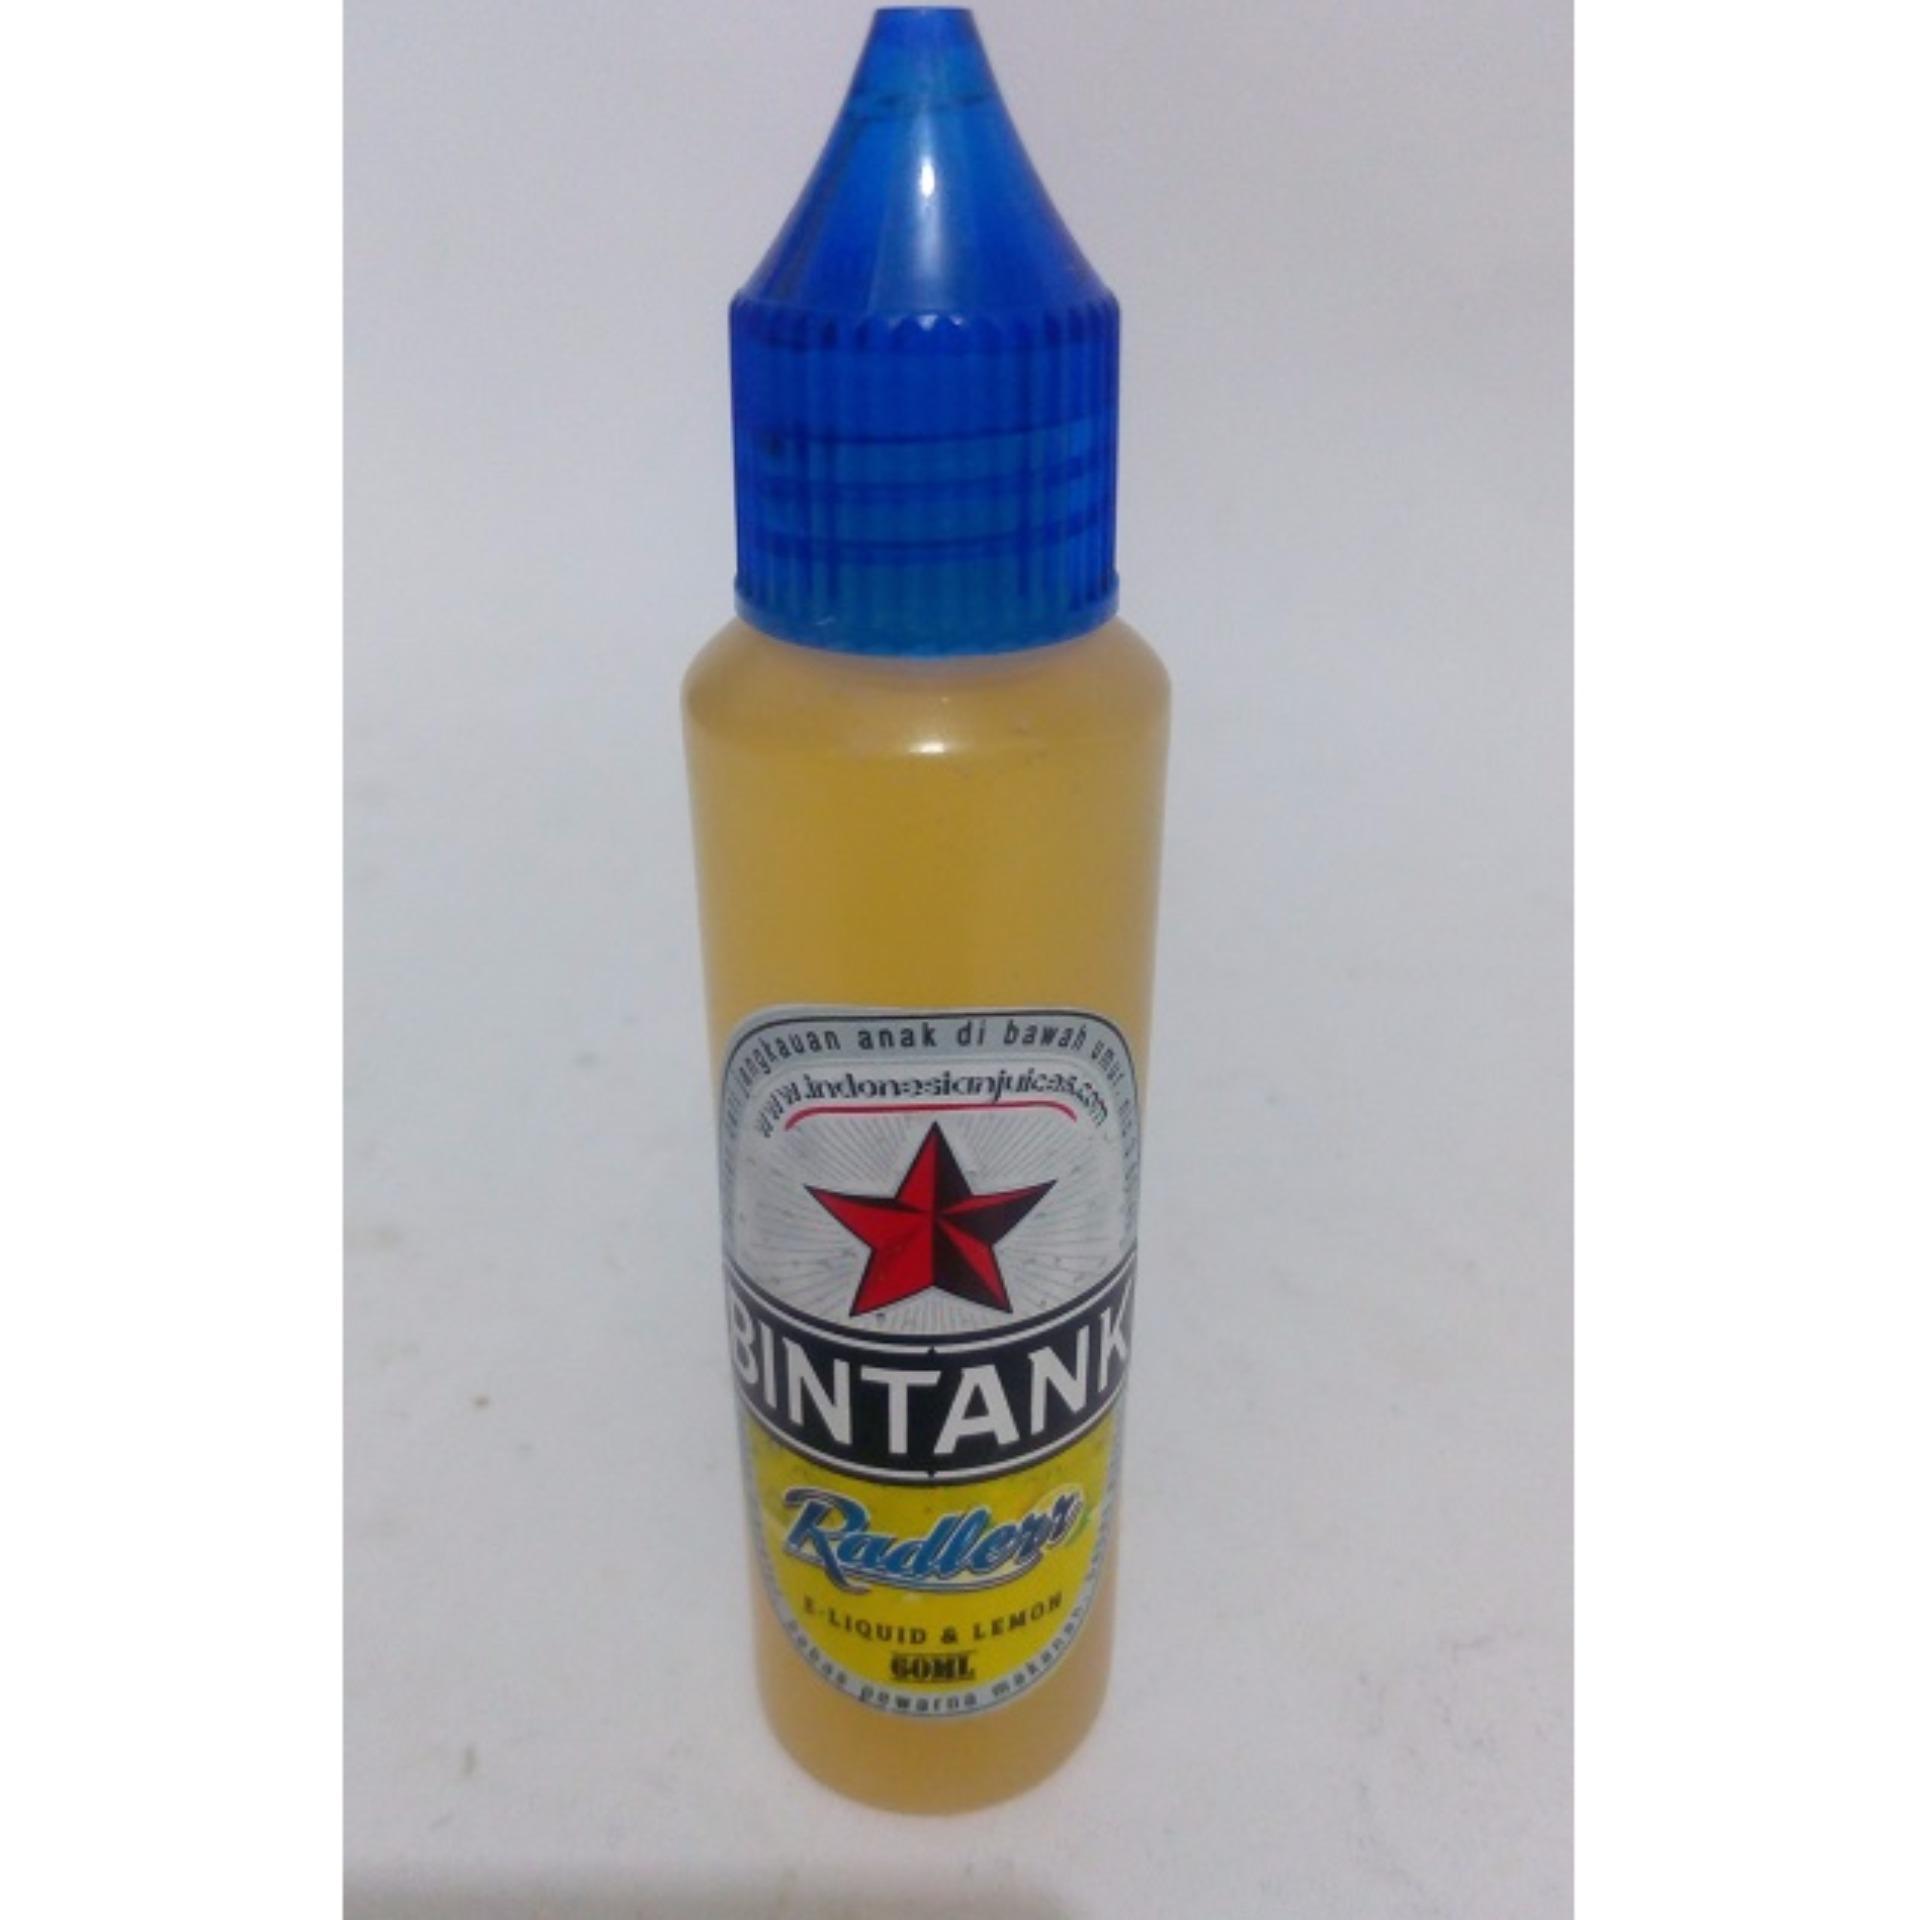 Toko Bintang Radlerr Premium Liquid 60Ml Vape Vapor Lemon Online Terpercaya